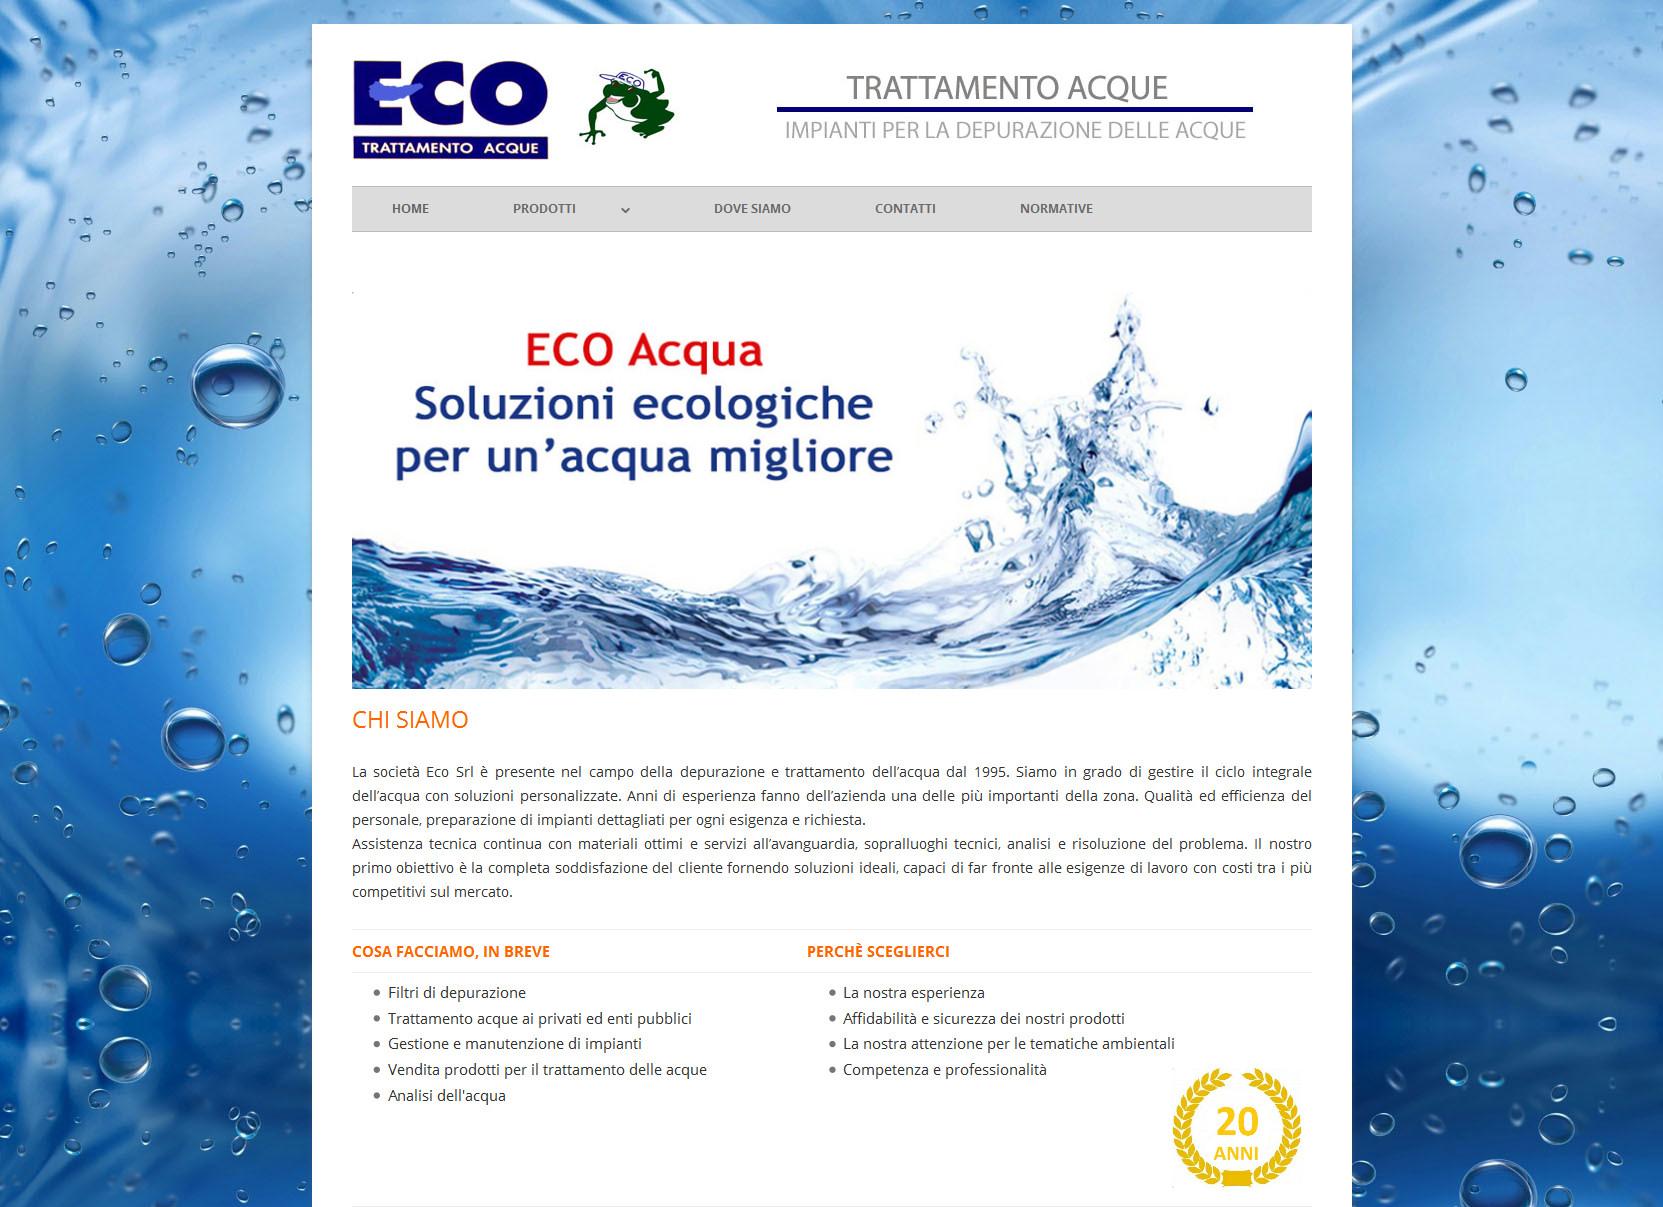 ecoacqua.it by Arnetweb.it